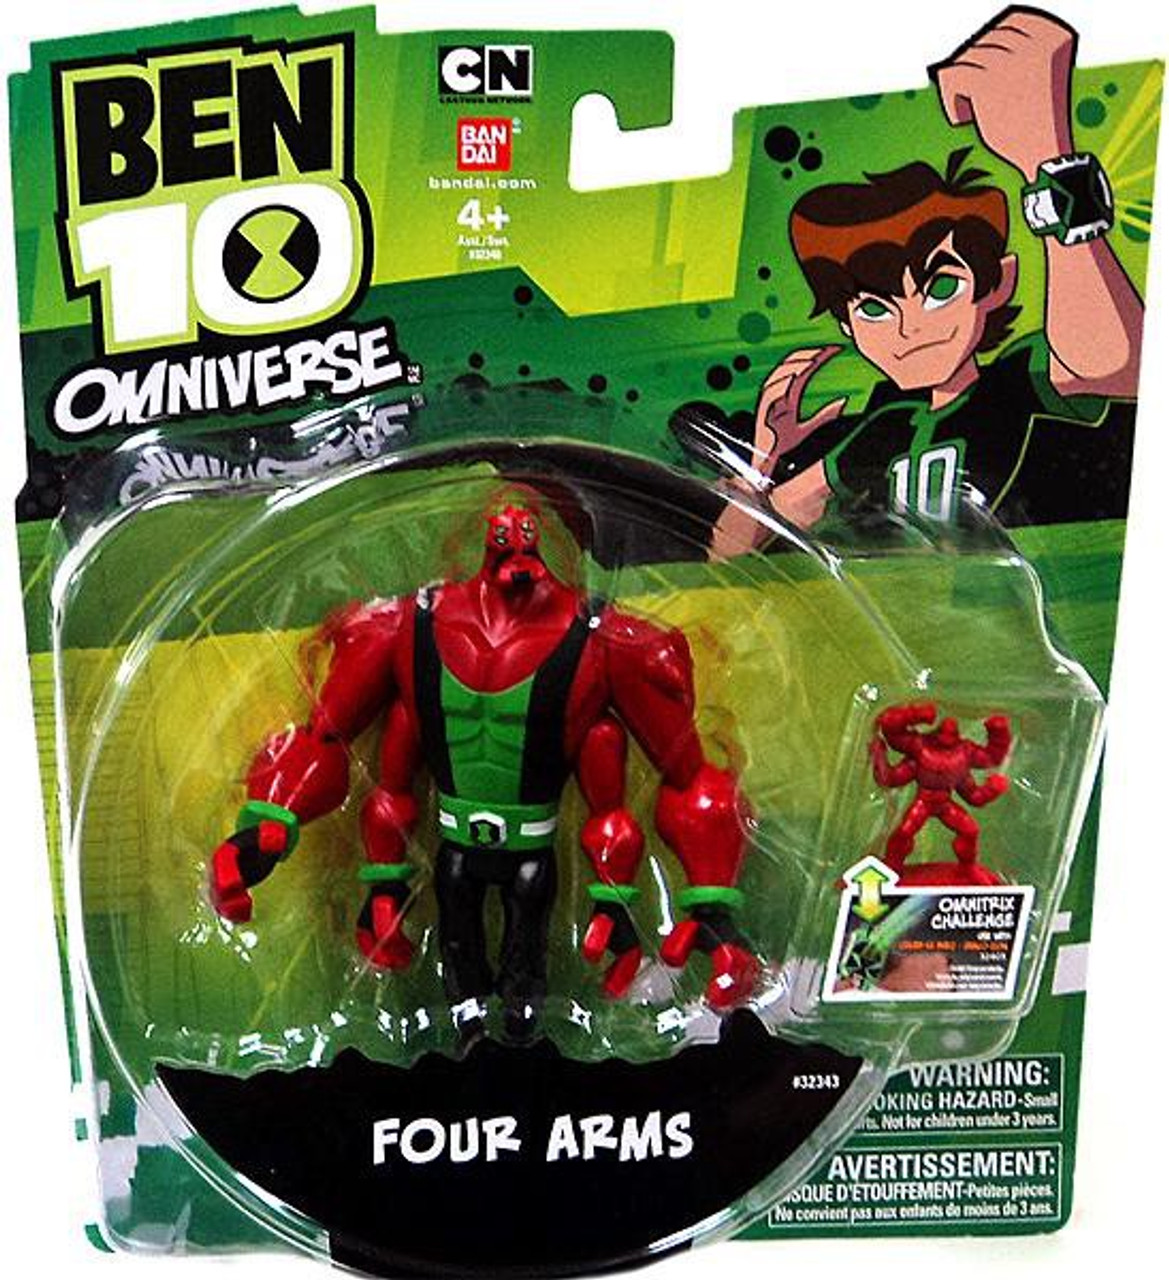 Ben 10 Omniverse Alien Action Figure Bandai